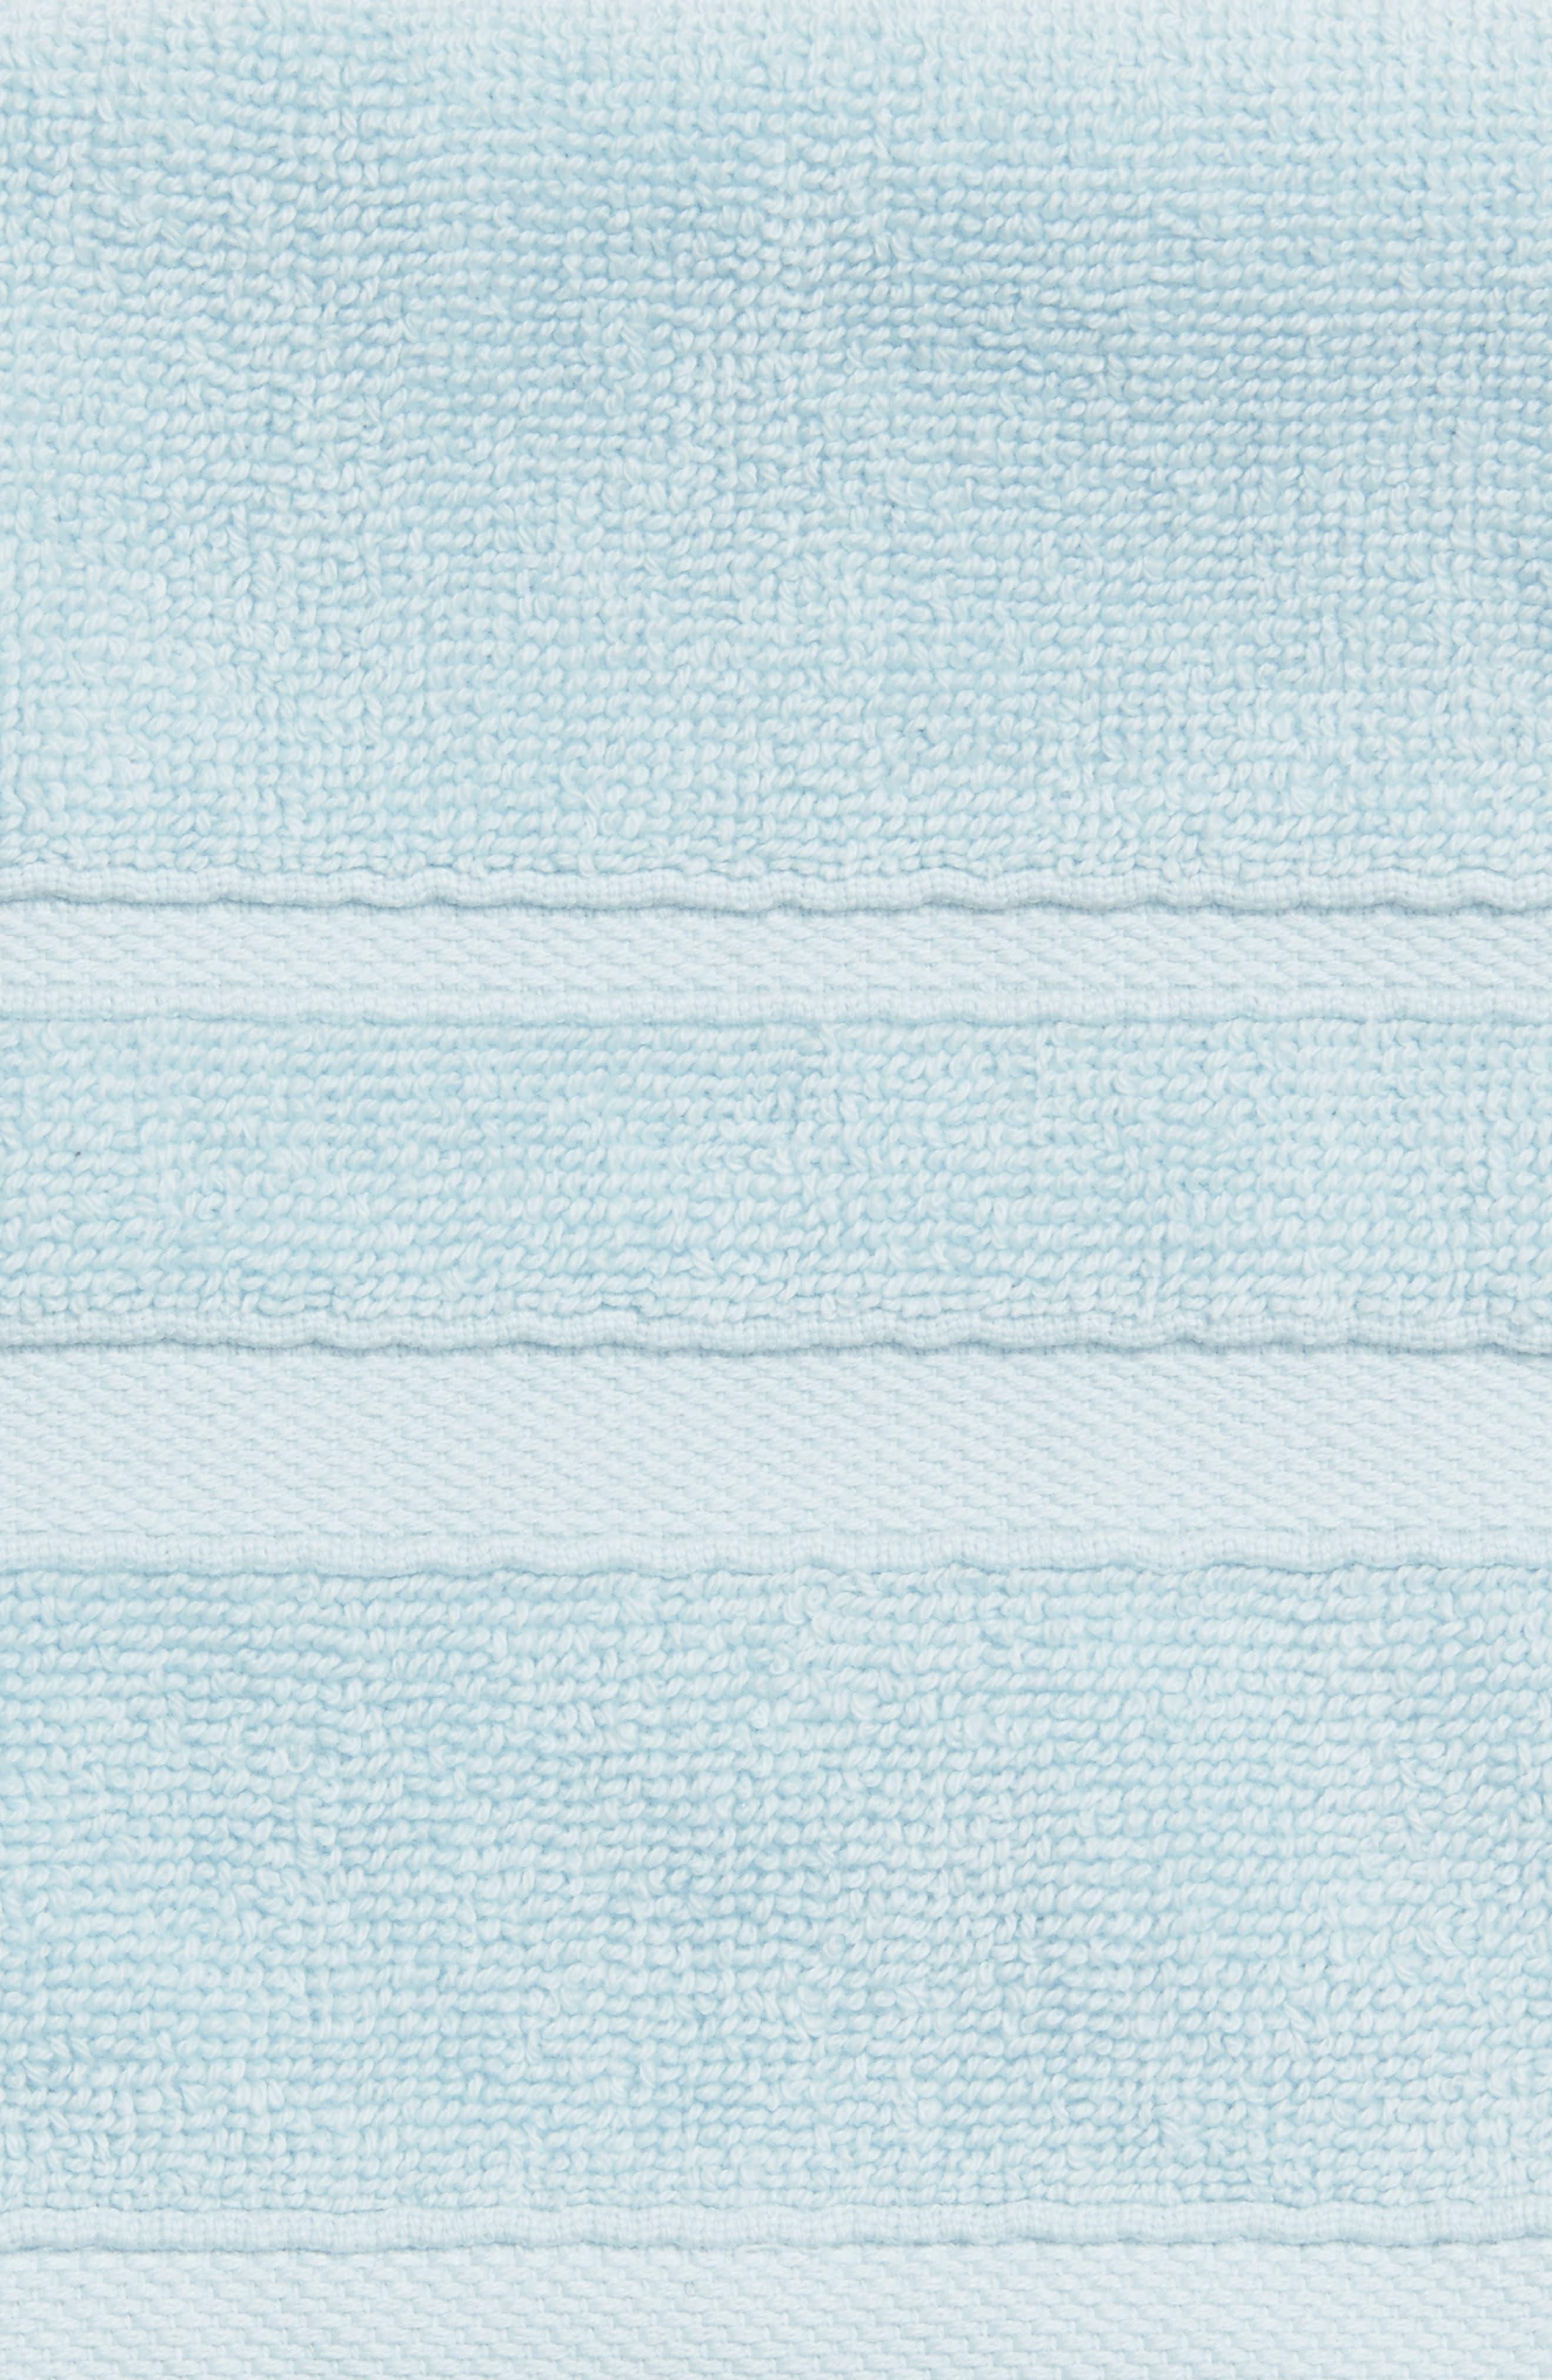 Studio 'Perennial' Combed Turkish Cotton Washcloth,                             Alternate thumbnail 2, color,                             Chrystal Blue